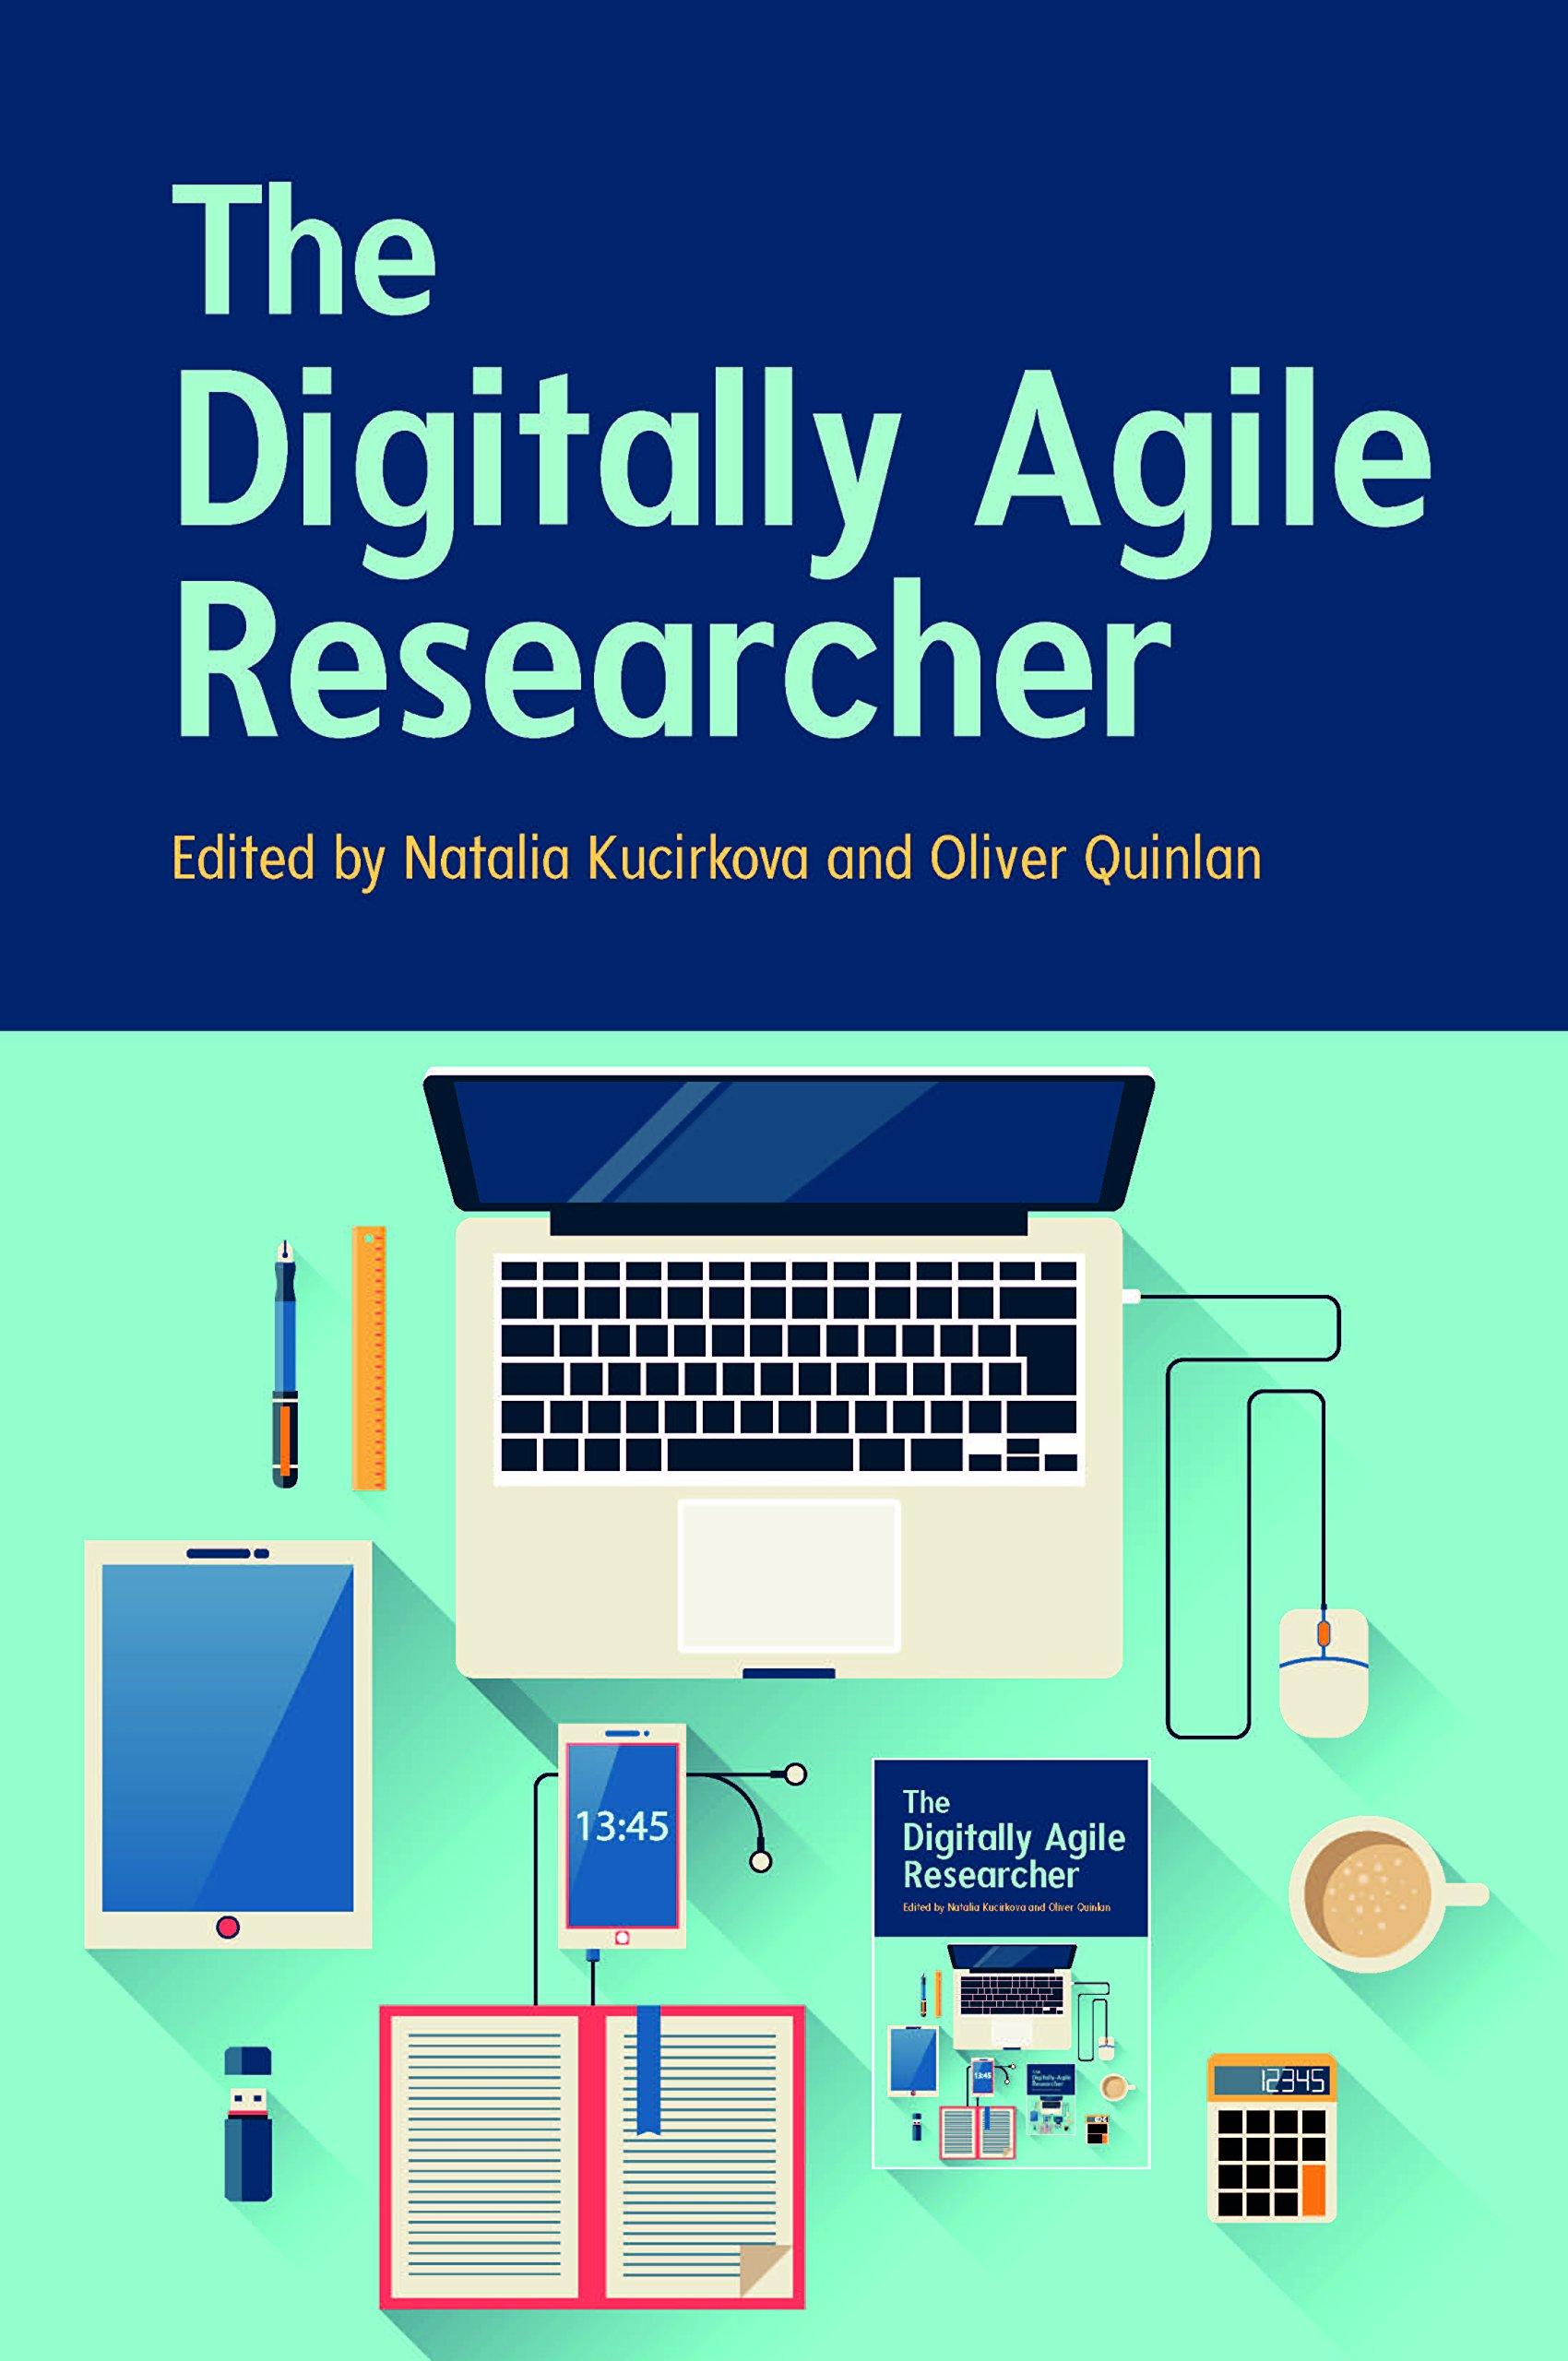 The Digitally Agile Researcher